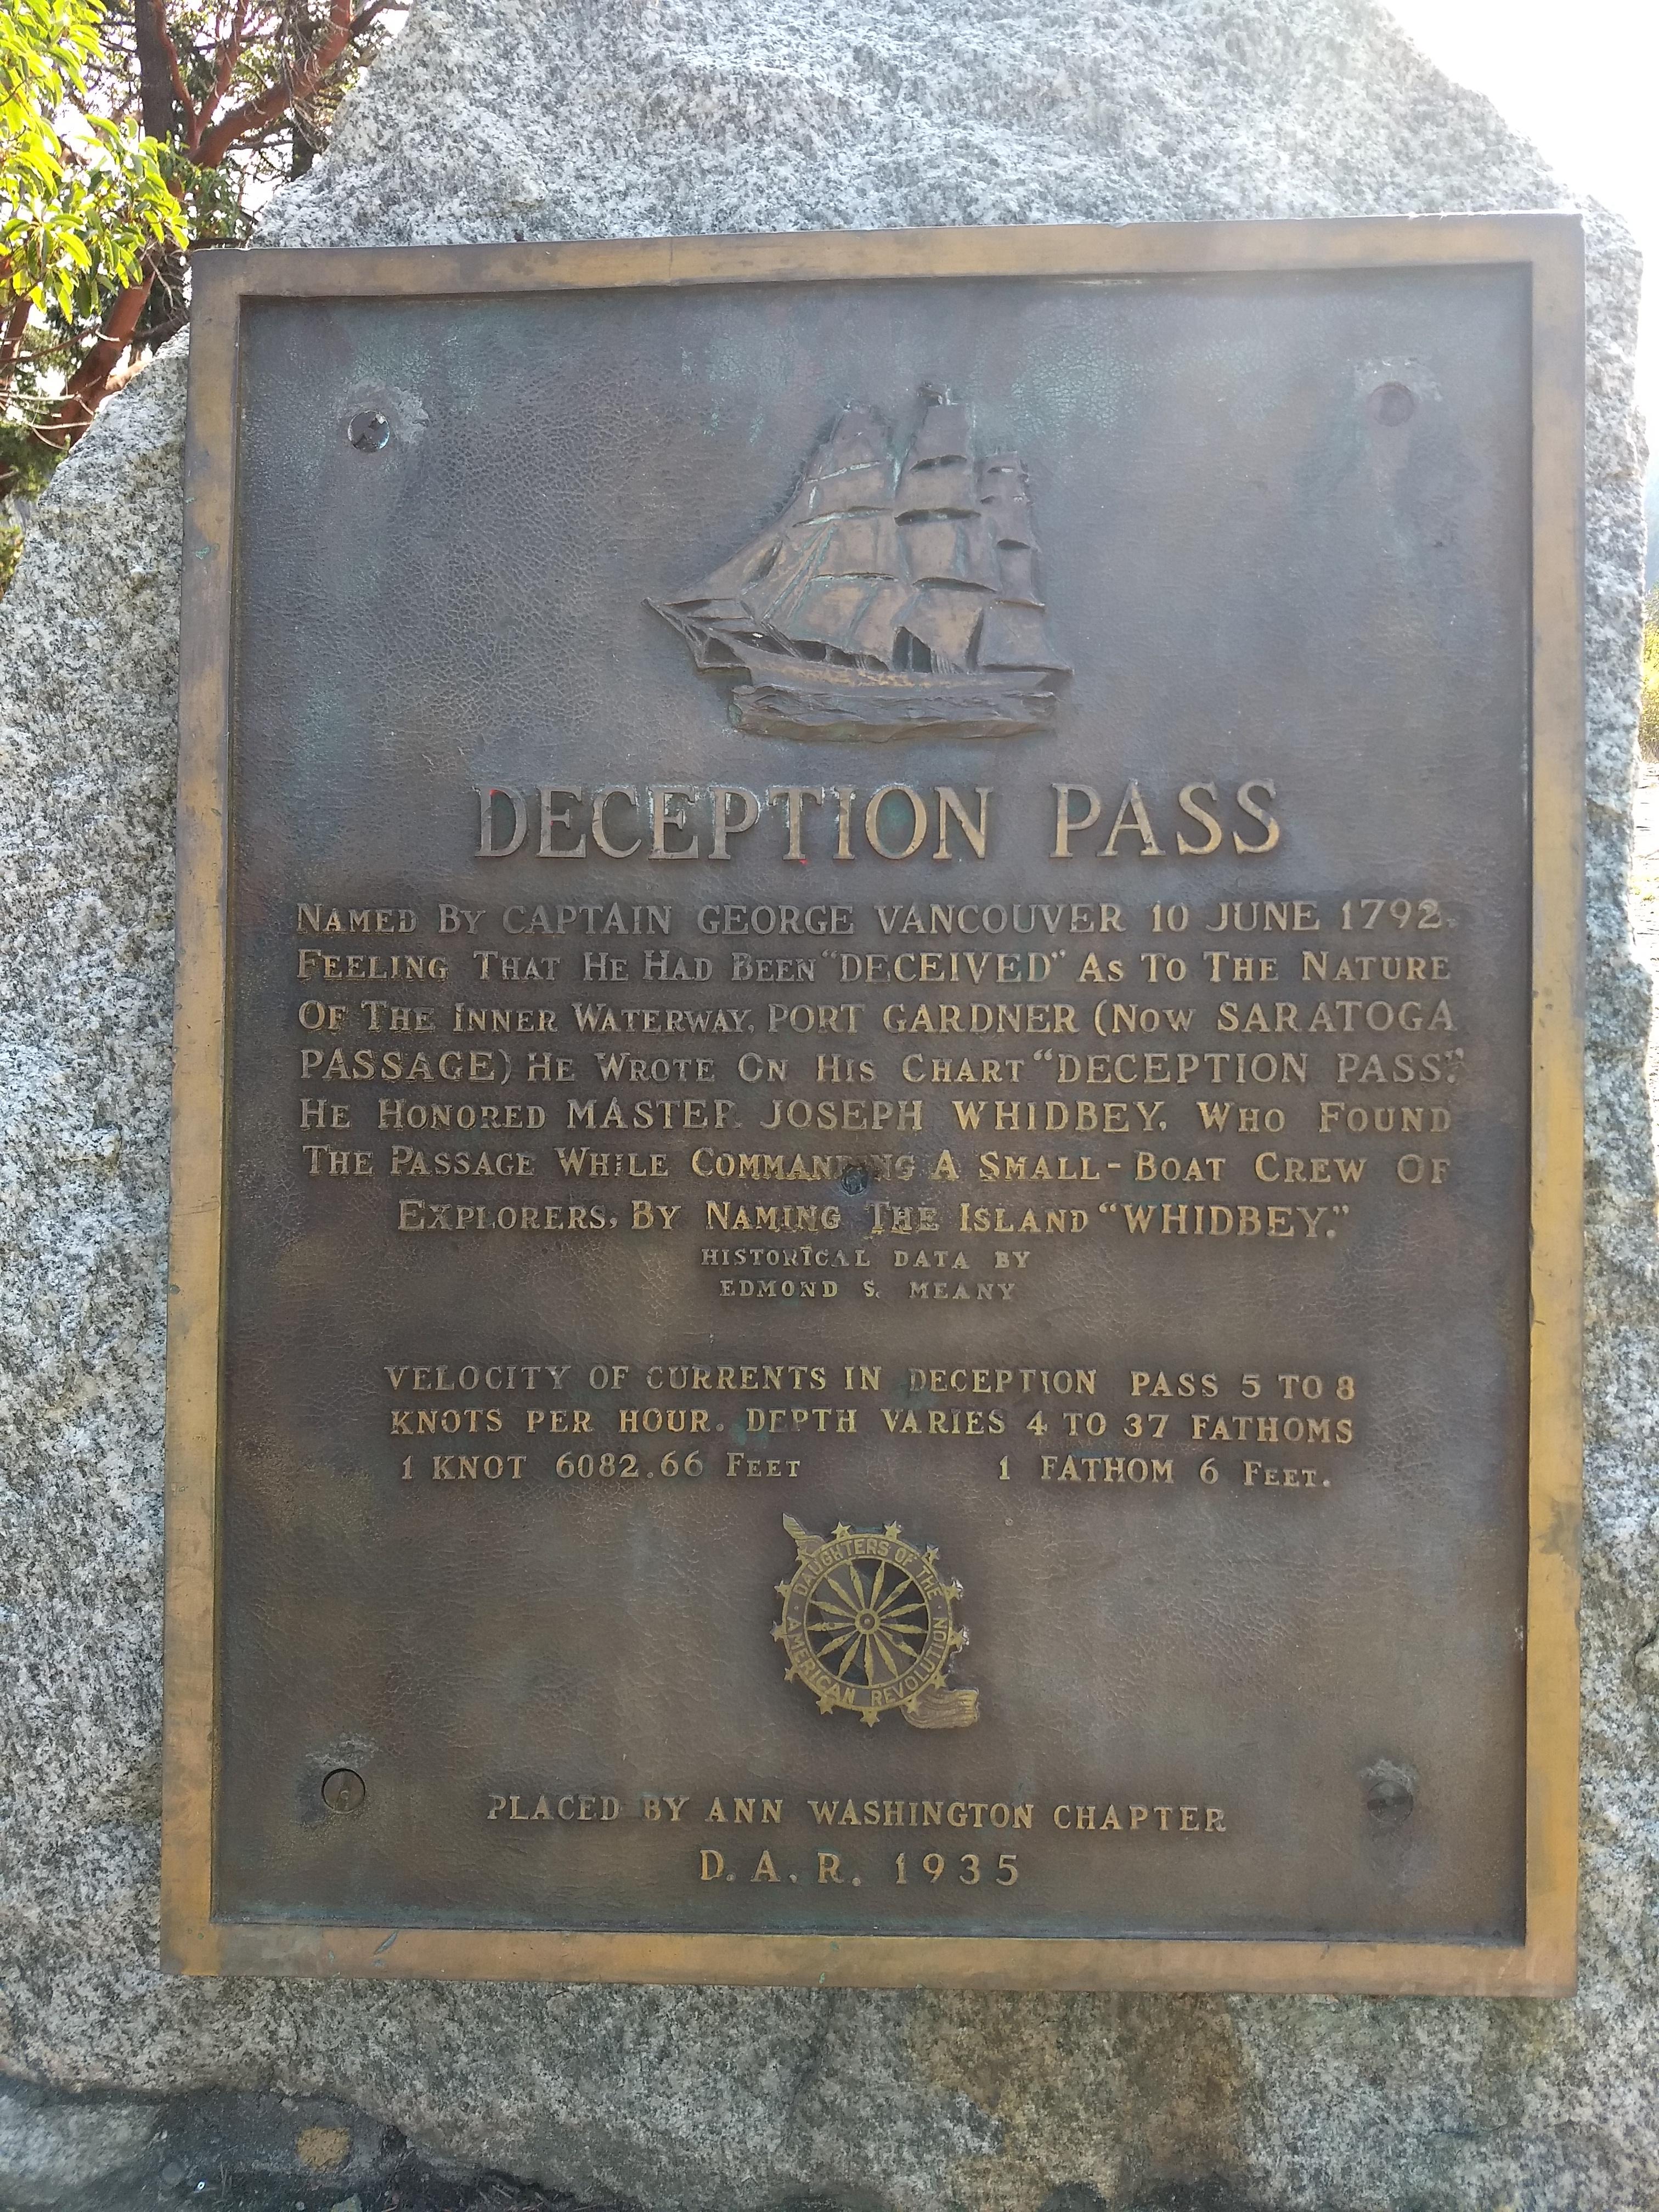 Interpretive Plaque at Deception Pass